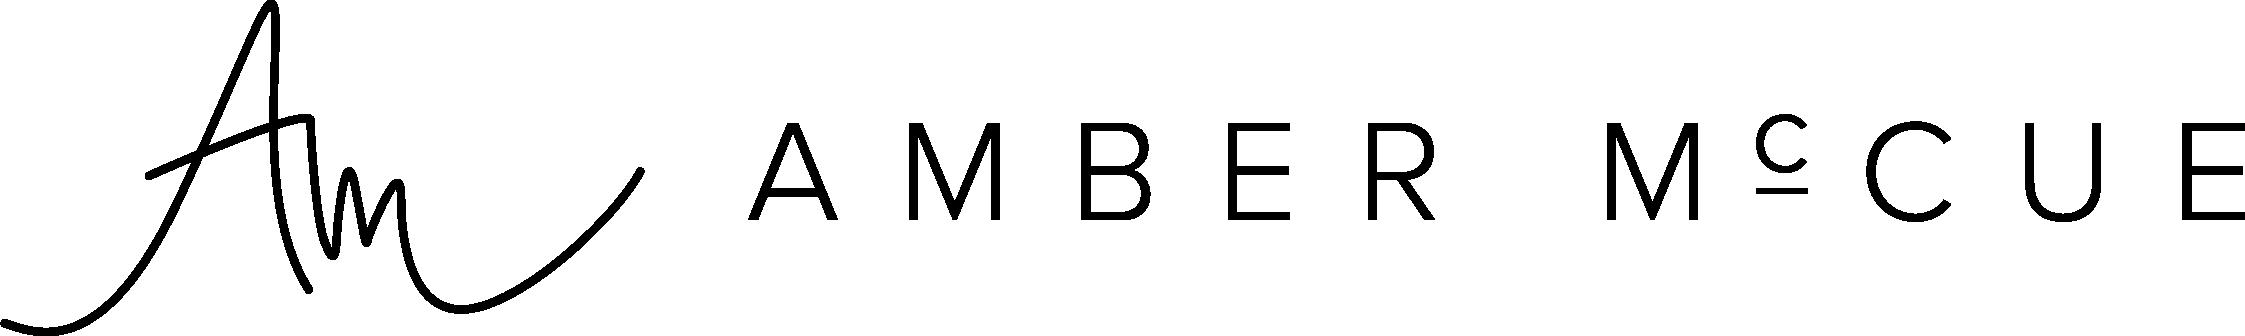 Amber McCue Logo